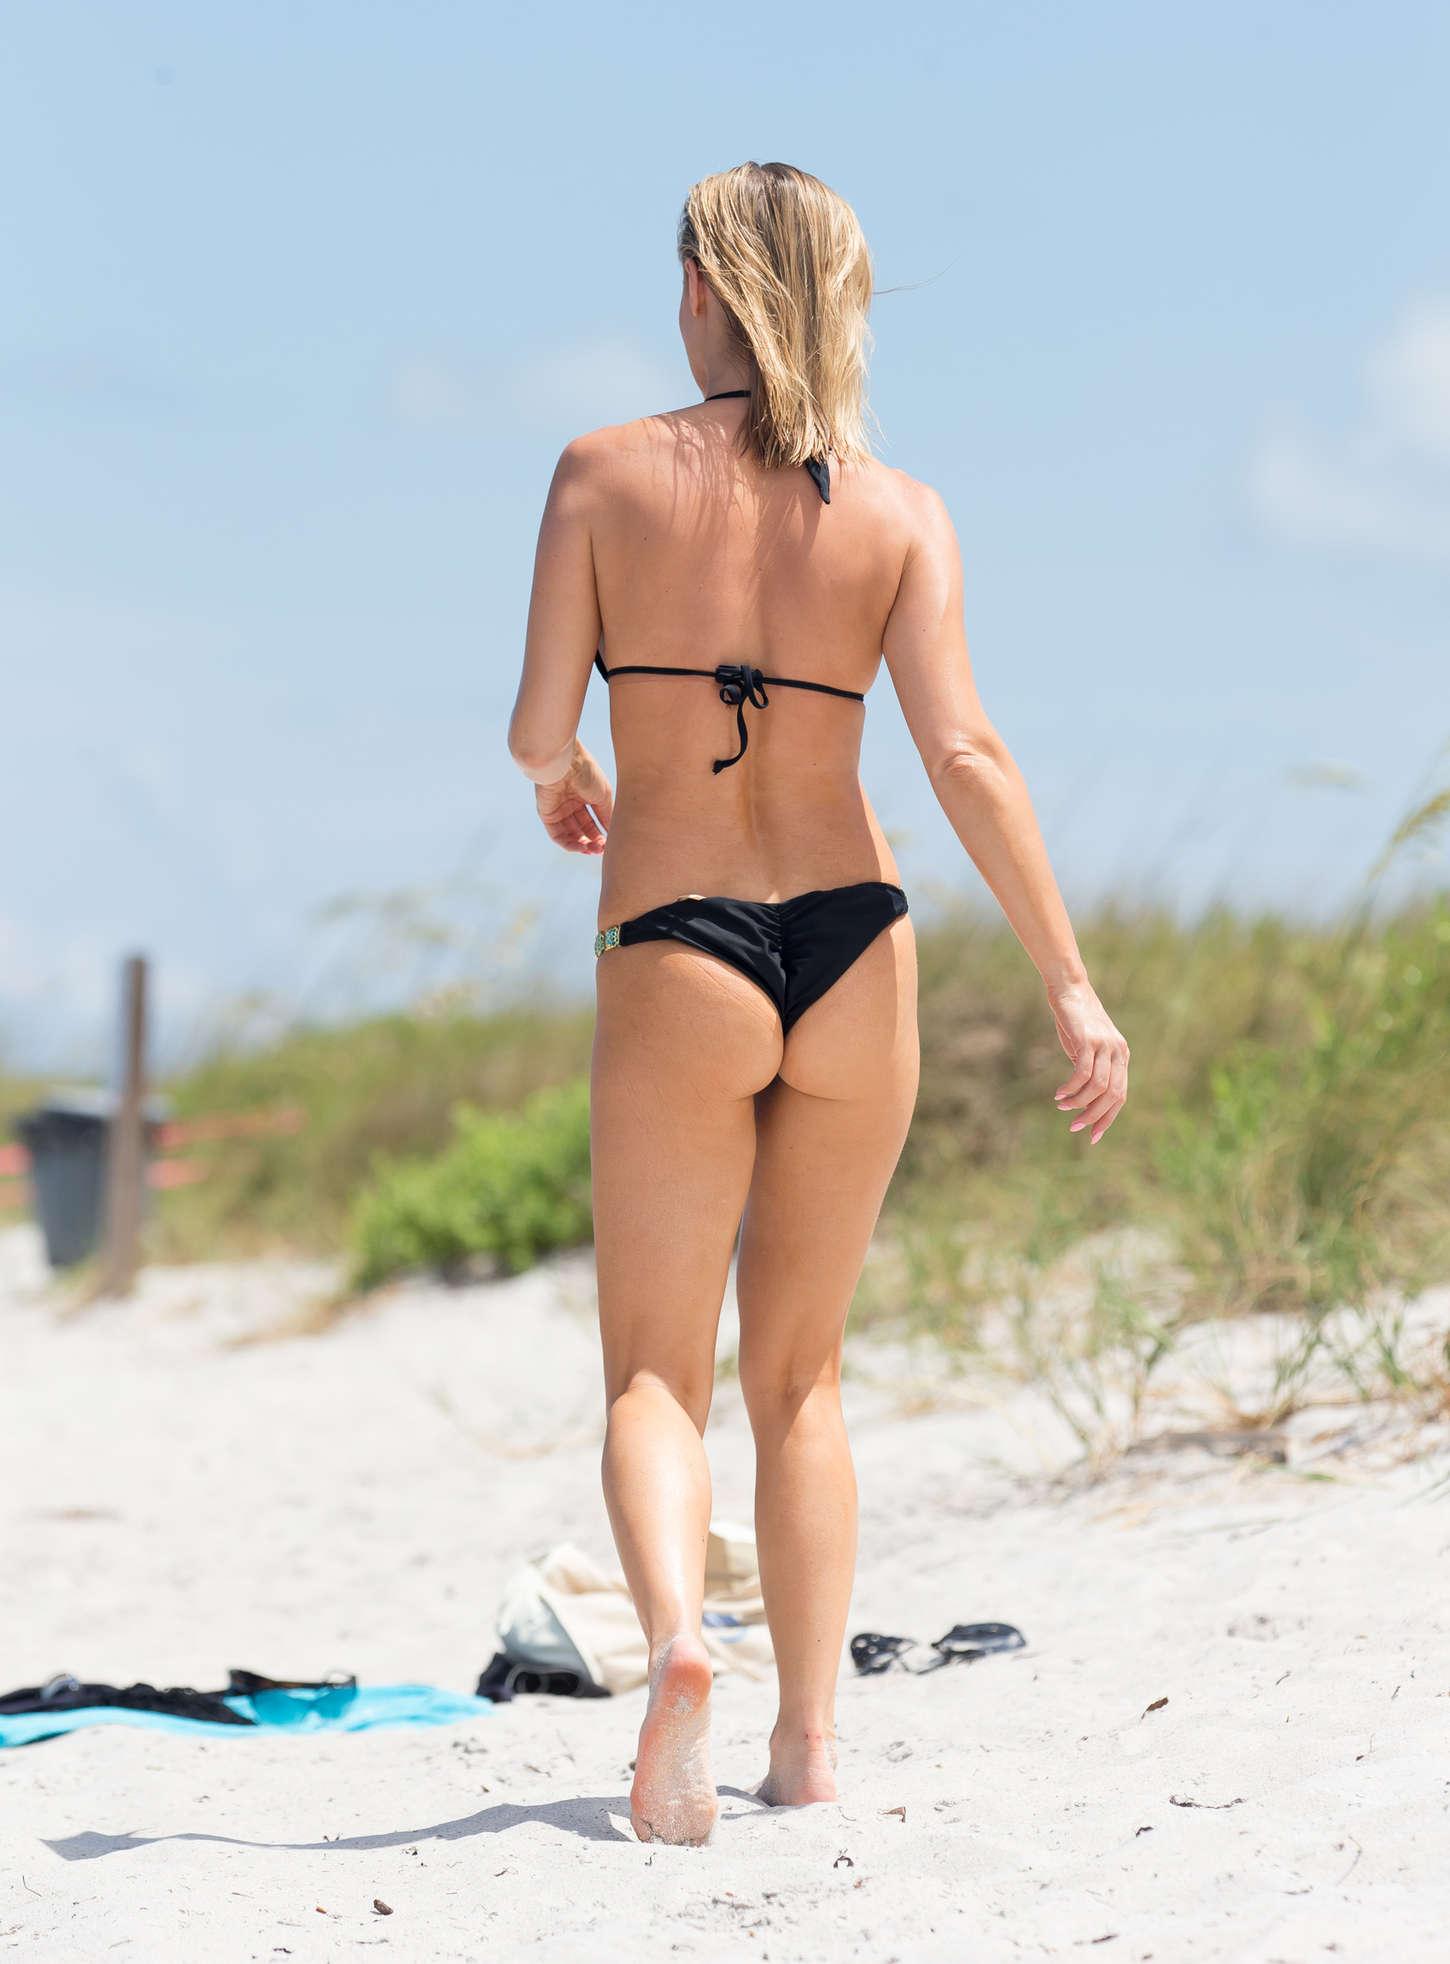 Joanna Krupa In Black Bikini 17 Gotceleb